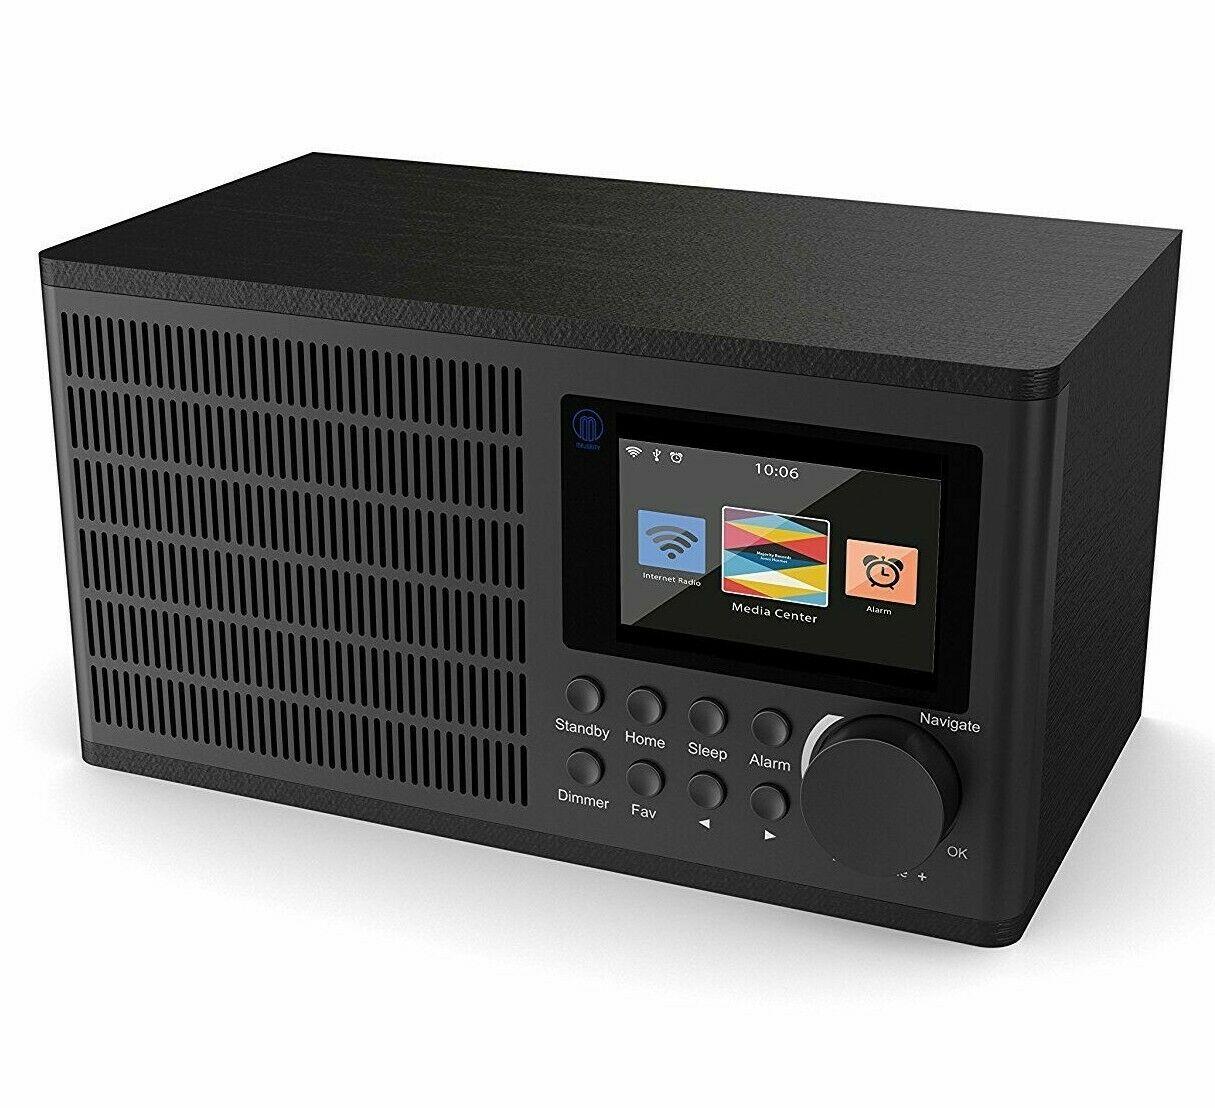 Majority Radio USB WiFi Radio Internet Dual Alarm Clock MP3 Play AUX In - Refurbished - £19.95 @ Ebay / Velocityelectronics